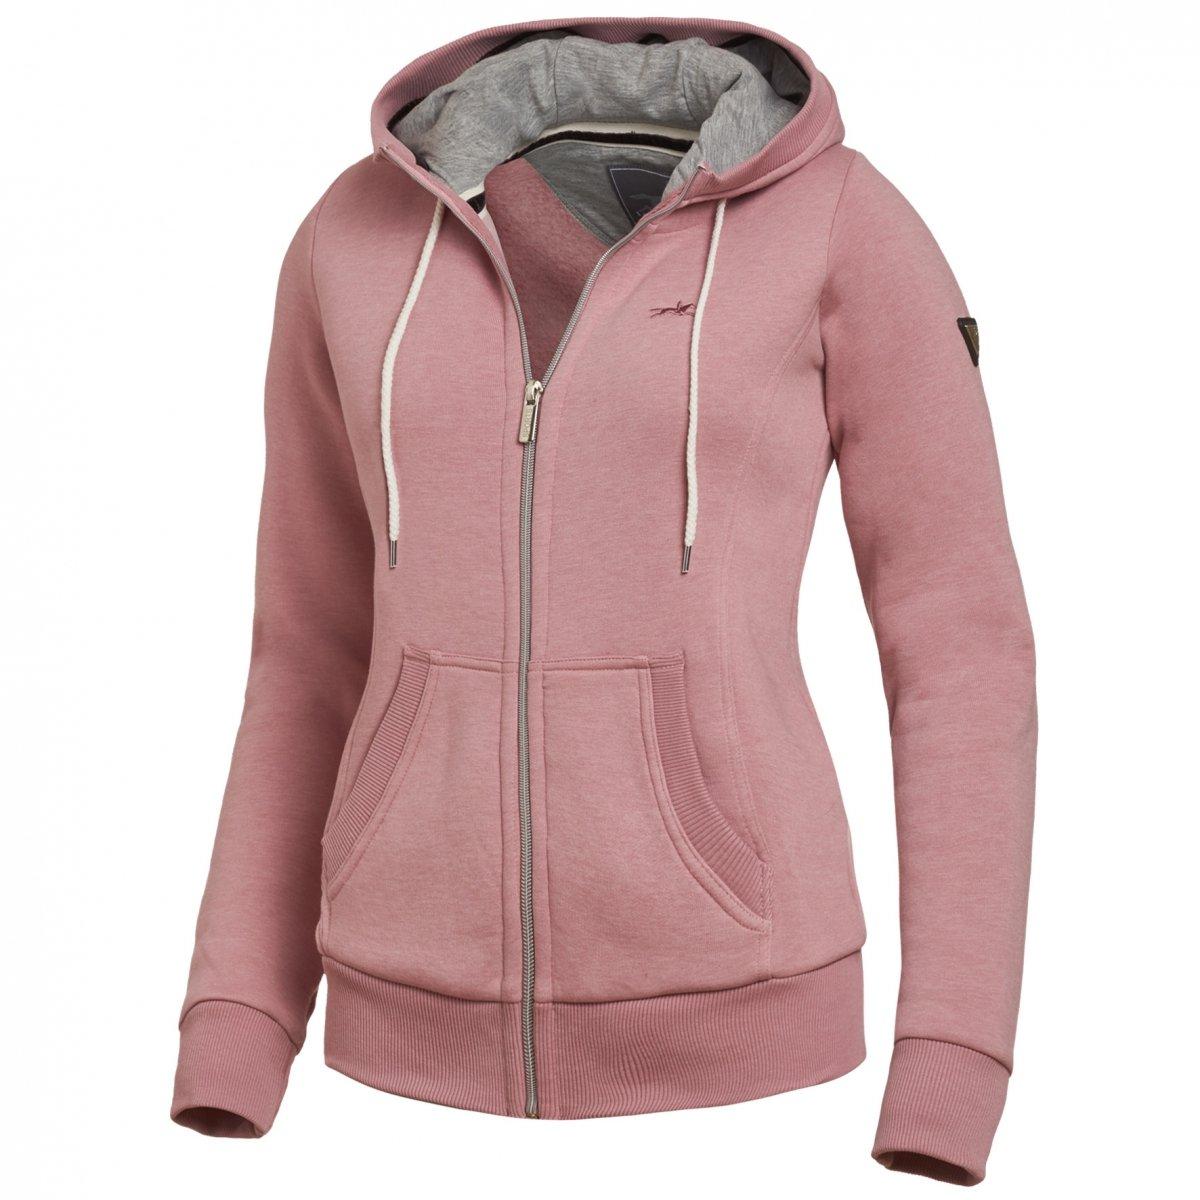 Bluza z kapturem CASSIE damska - Schockemohle - rose melange